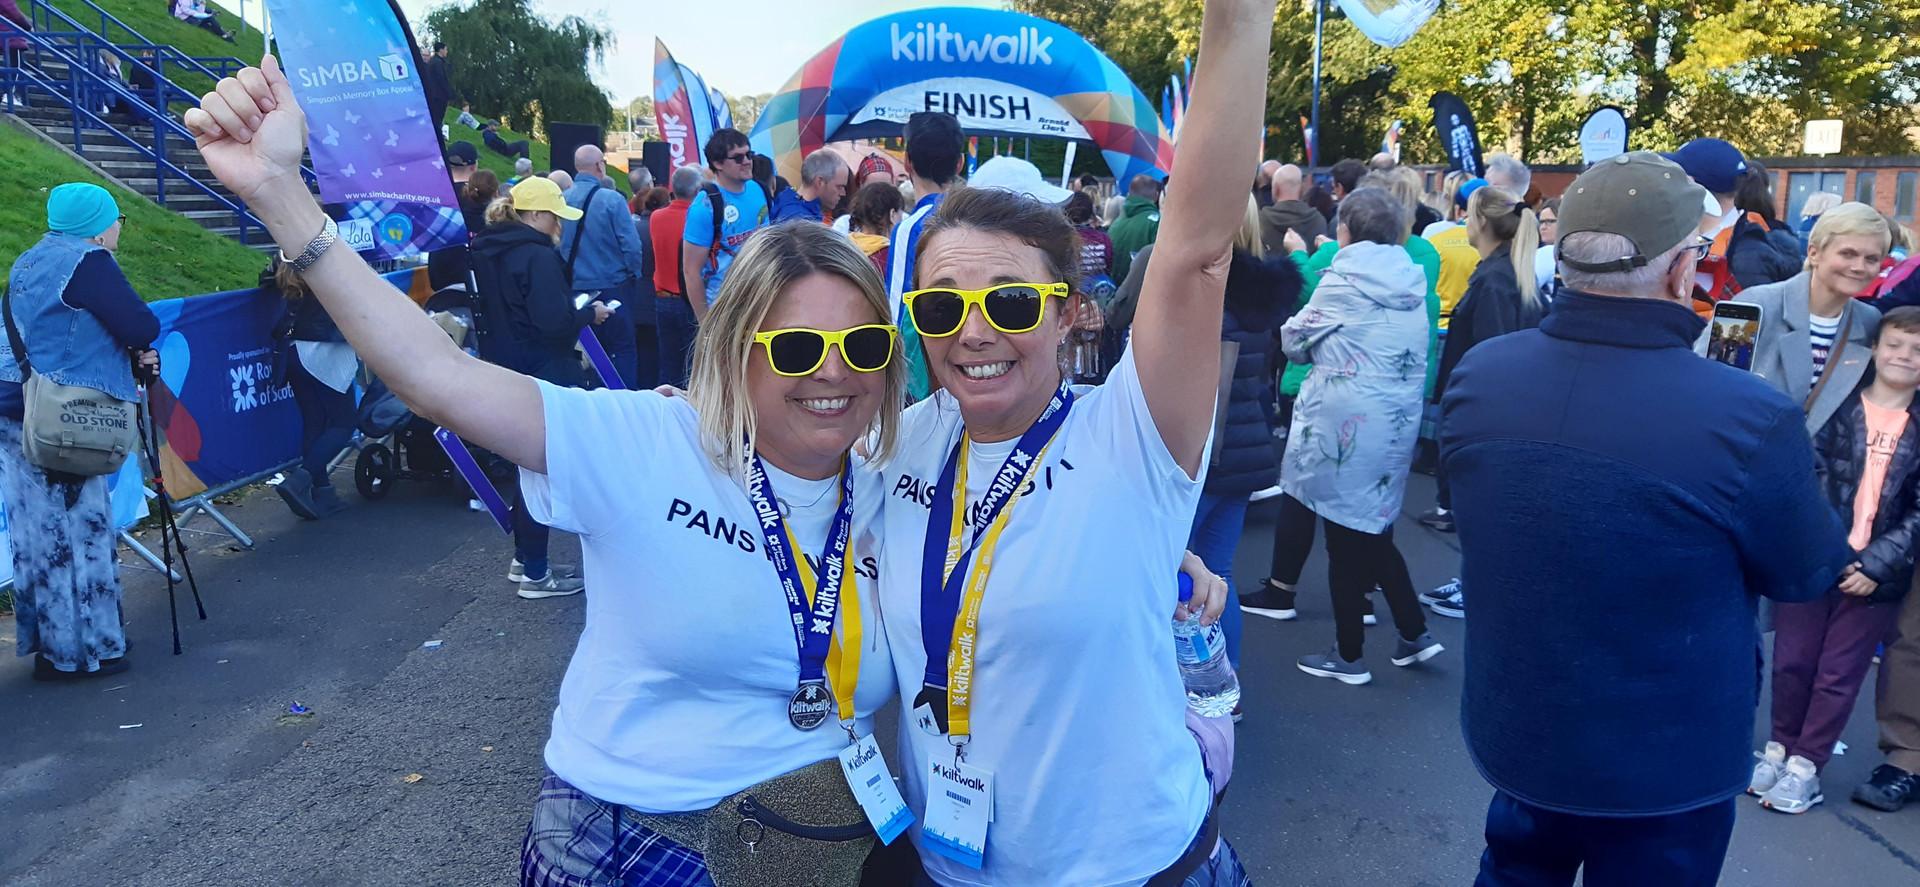 Lyn & Pauline Edinburgh Kiltwalk